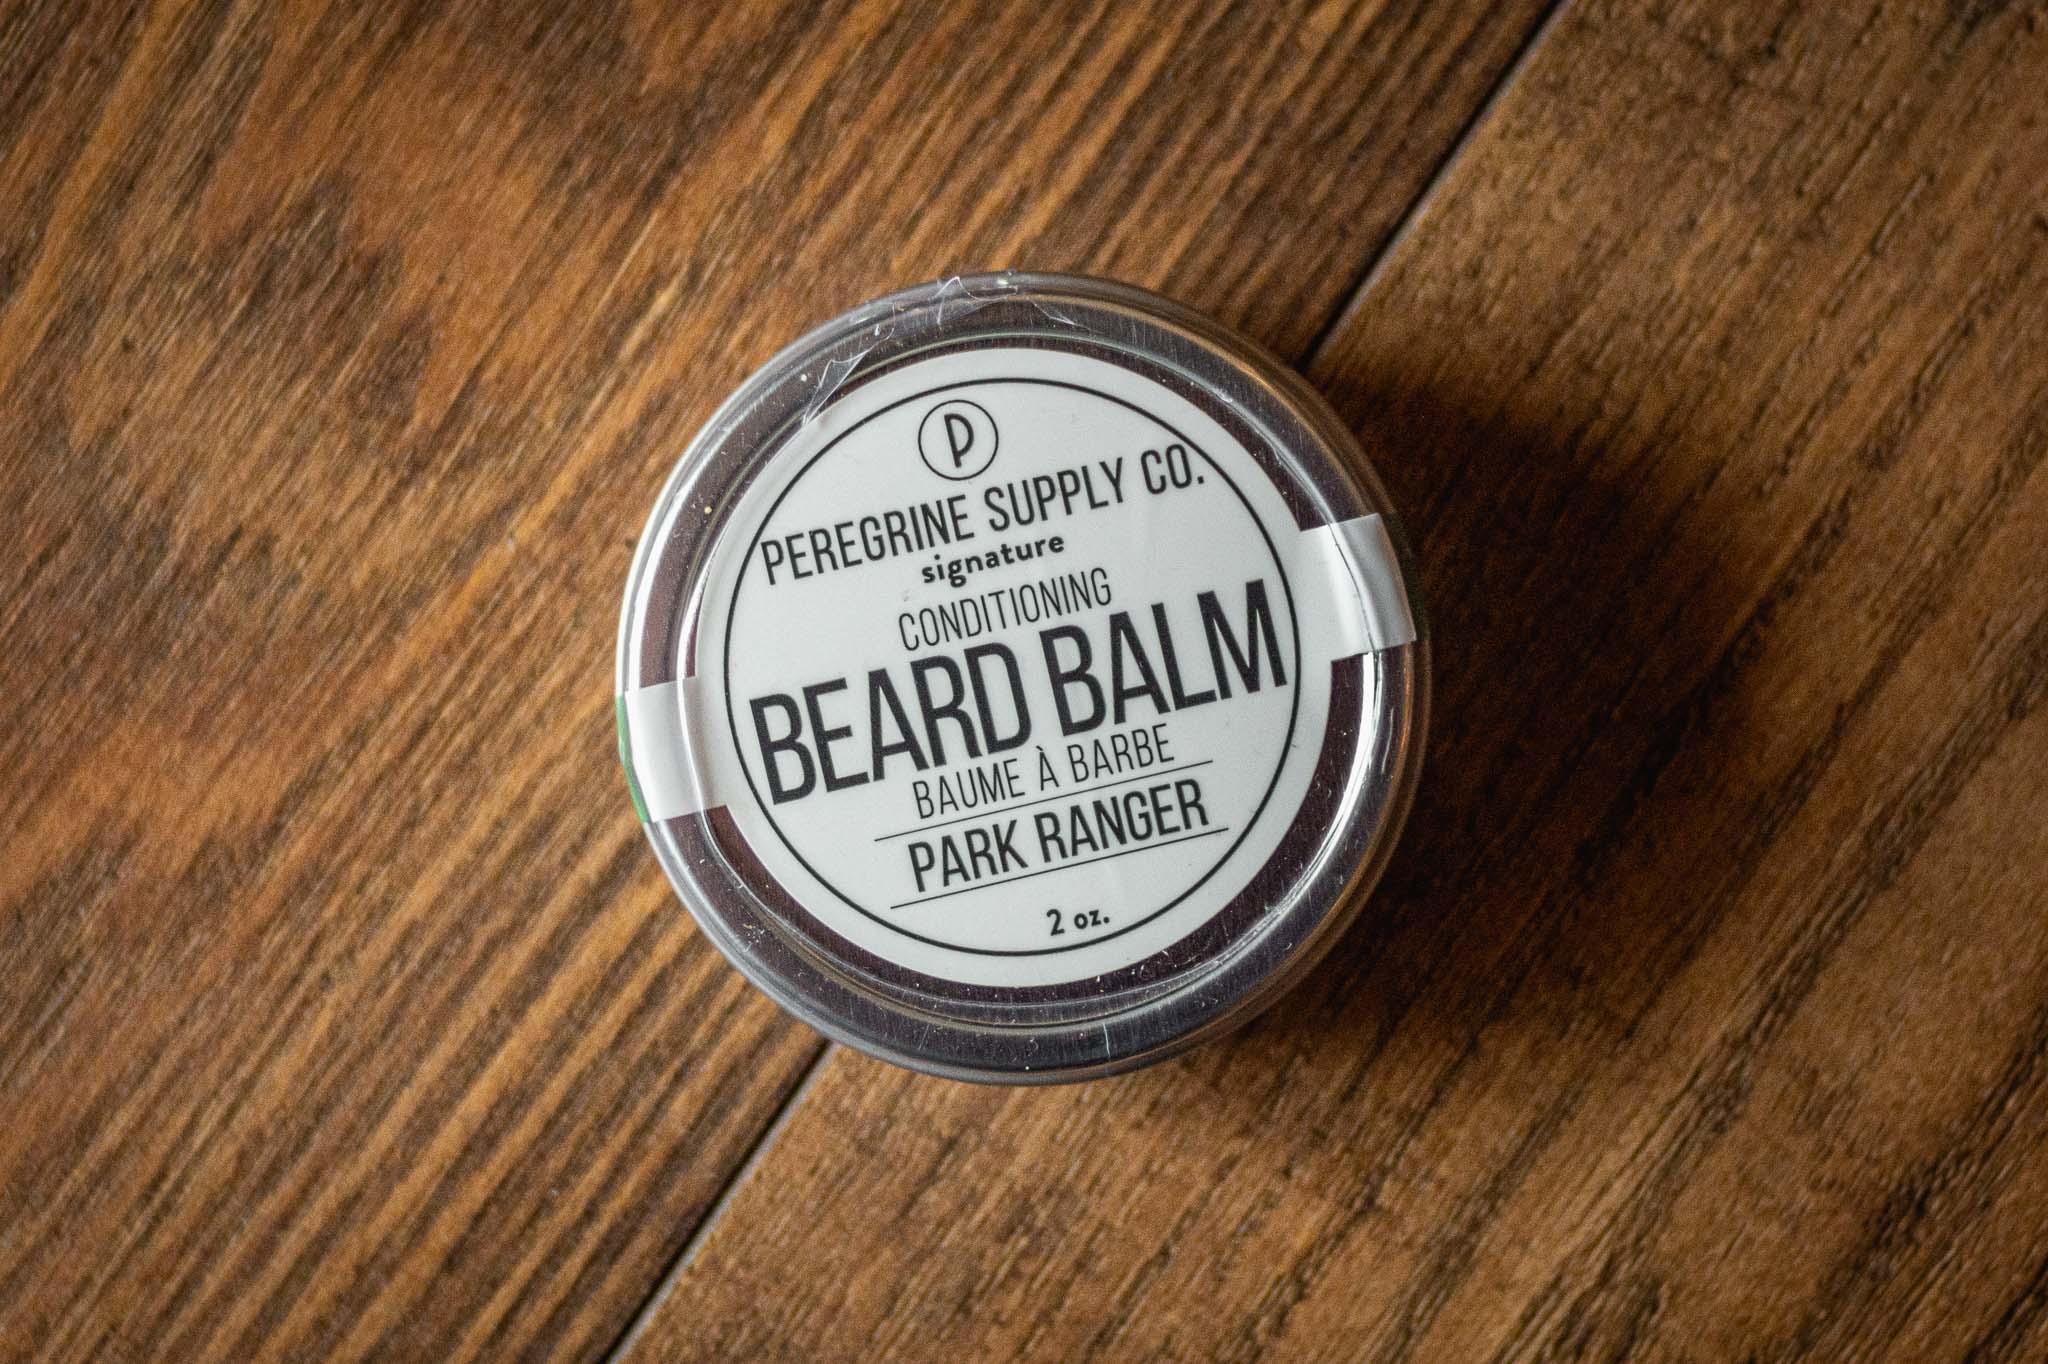 Beard Balm by Peregrine Supply Co